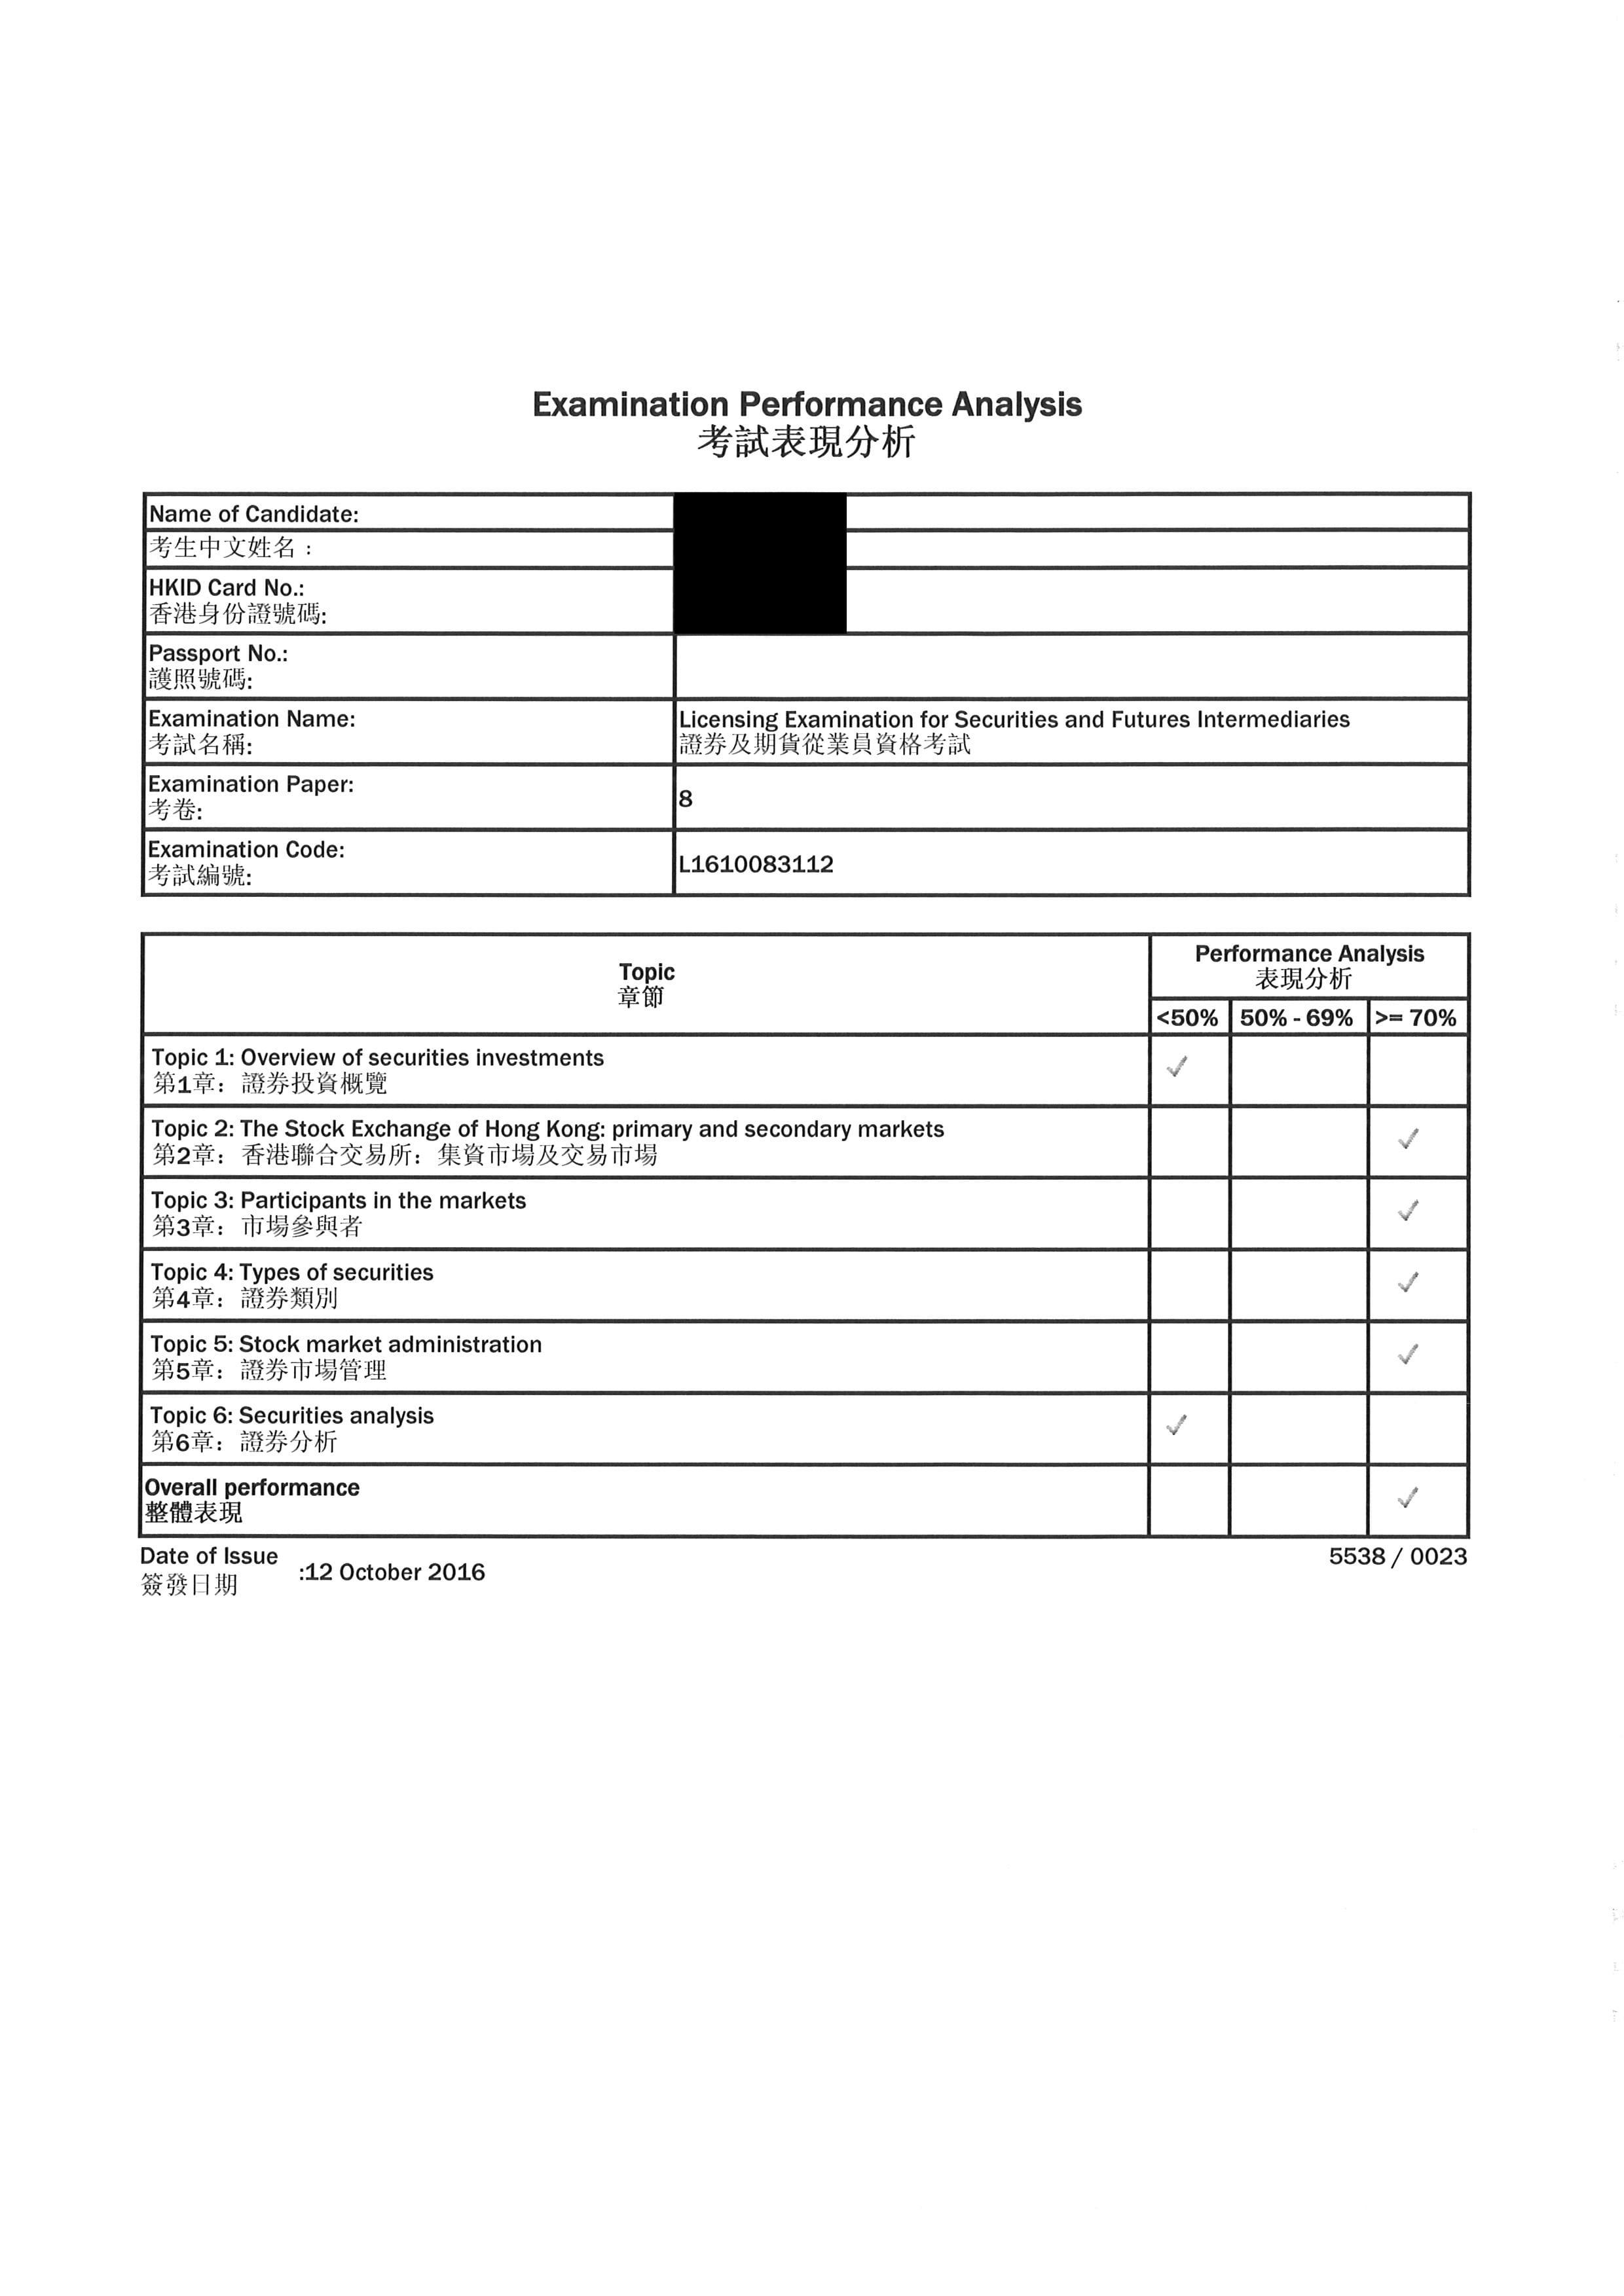 LCW 12/10/2016 LE Paper 8 證券期貨從業員資格考試卷八 Pass